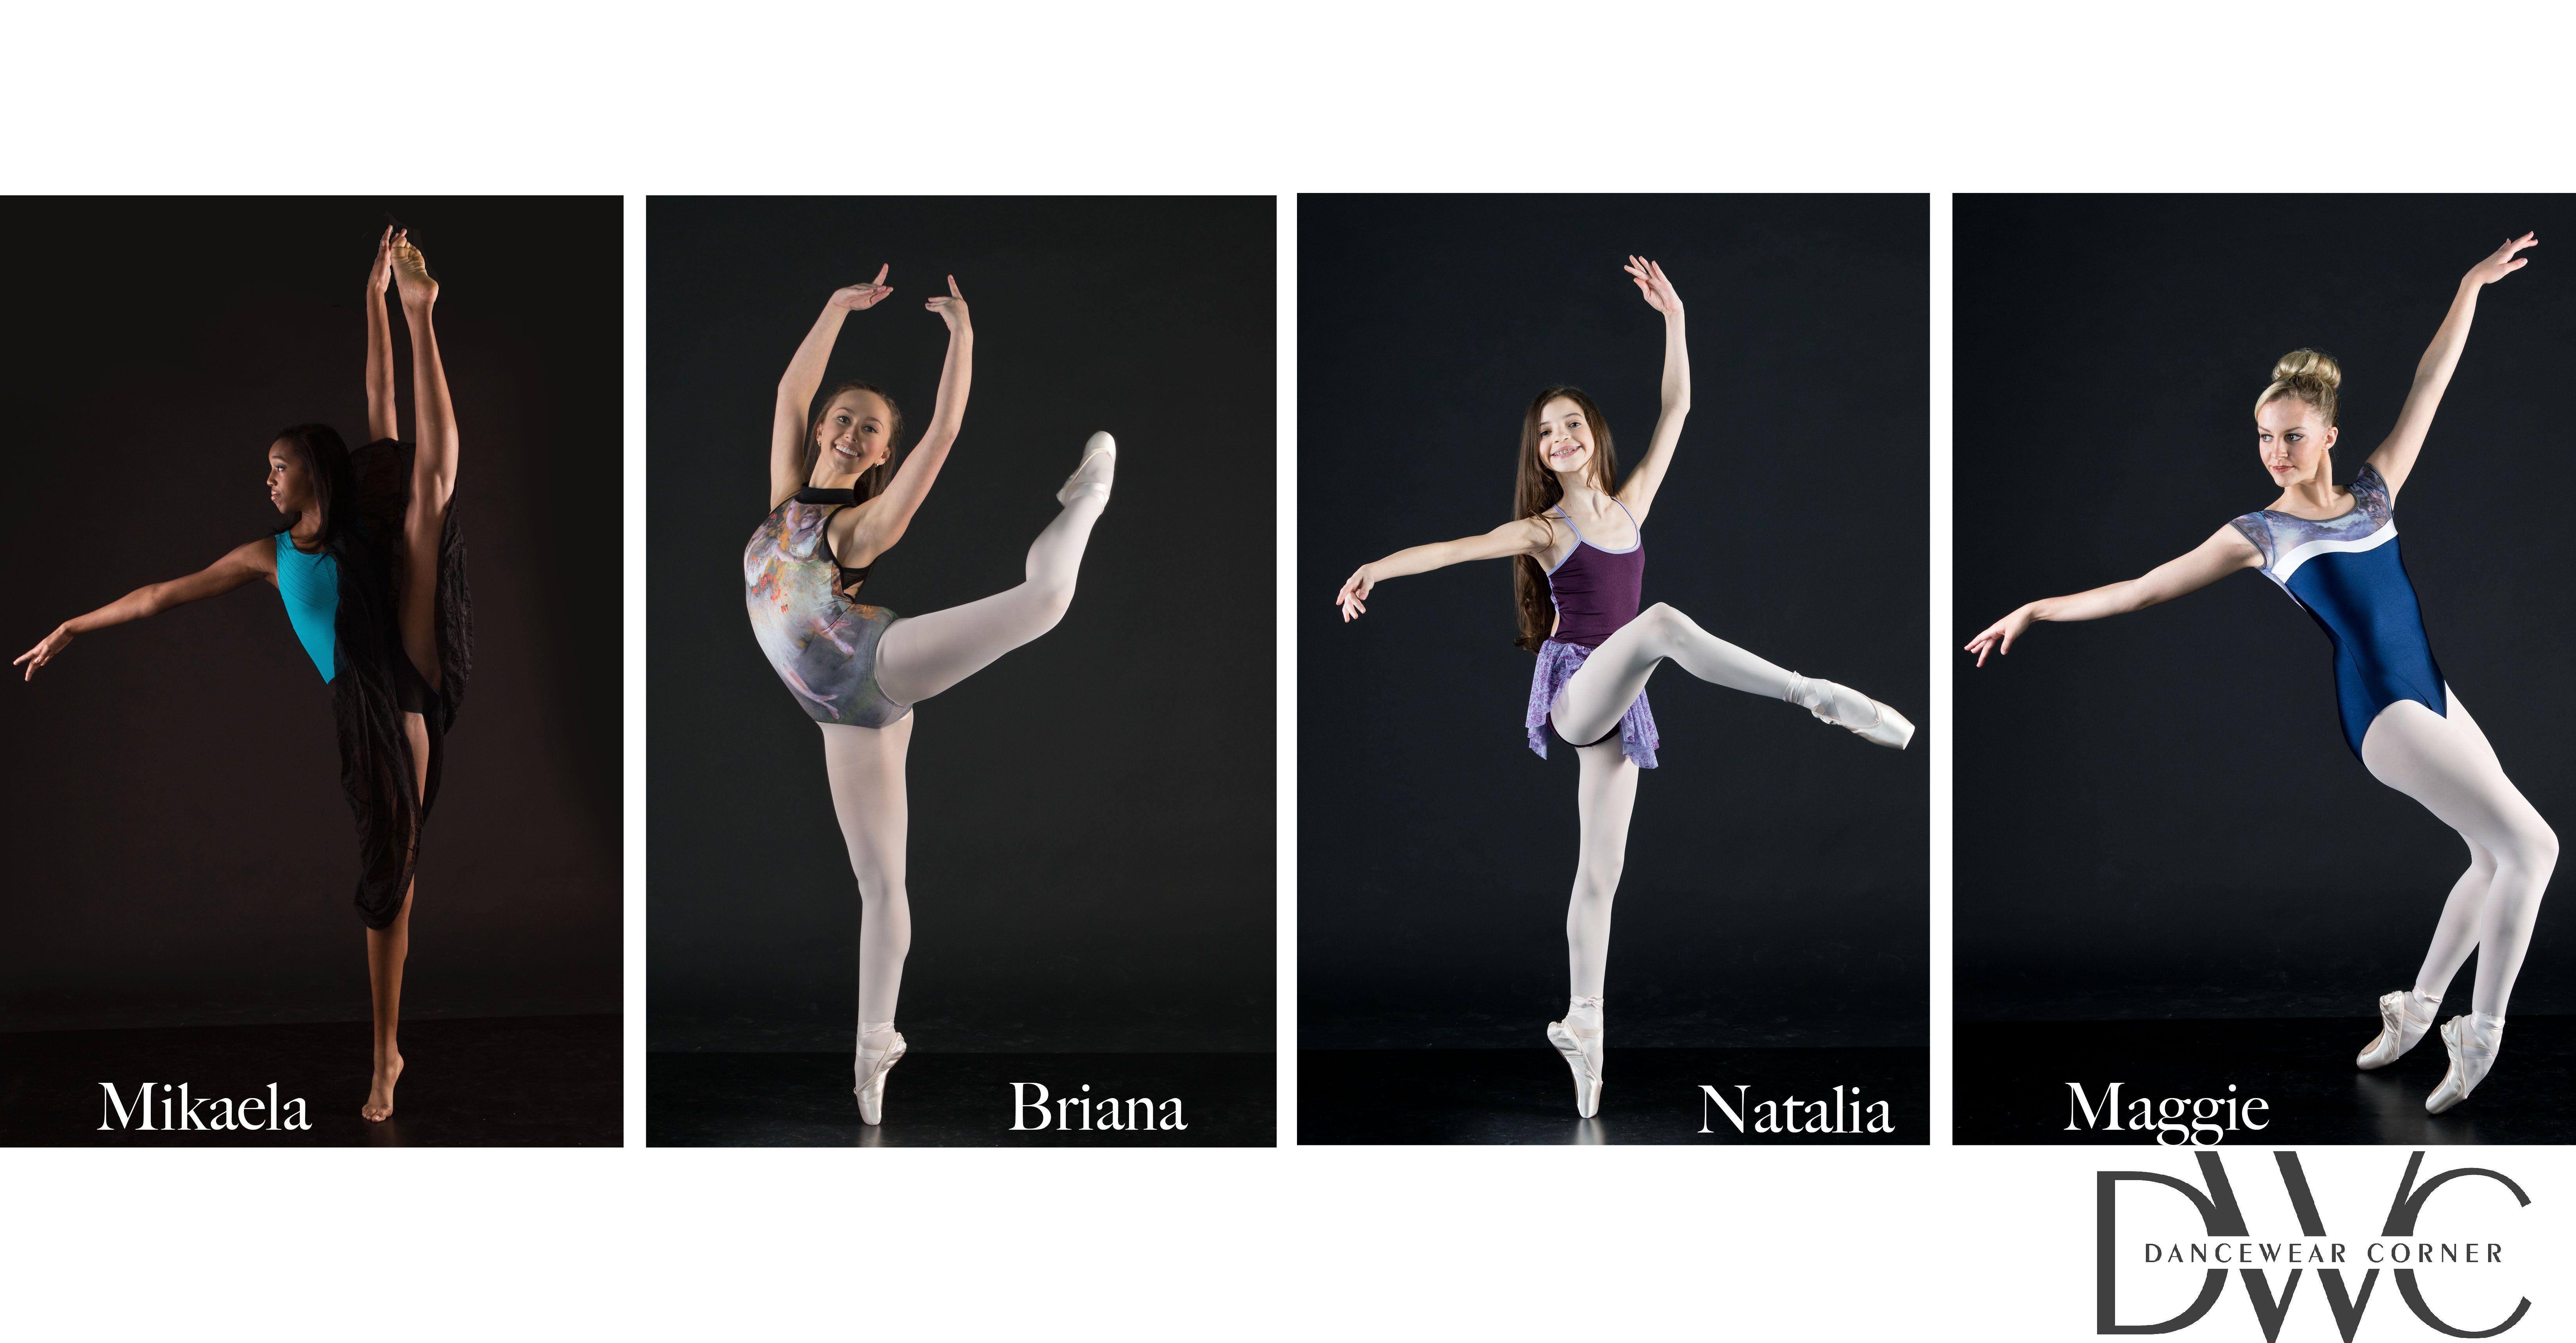 DanceWear Corner Model Dancers Dance Pose Jump